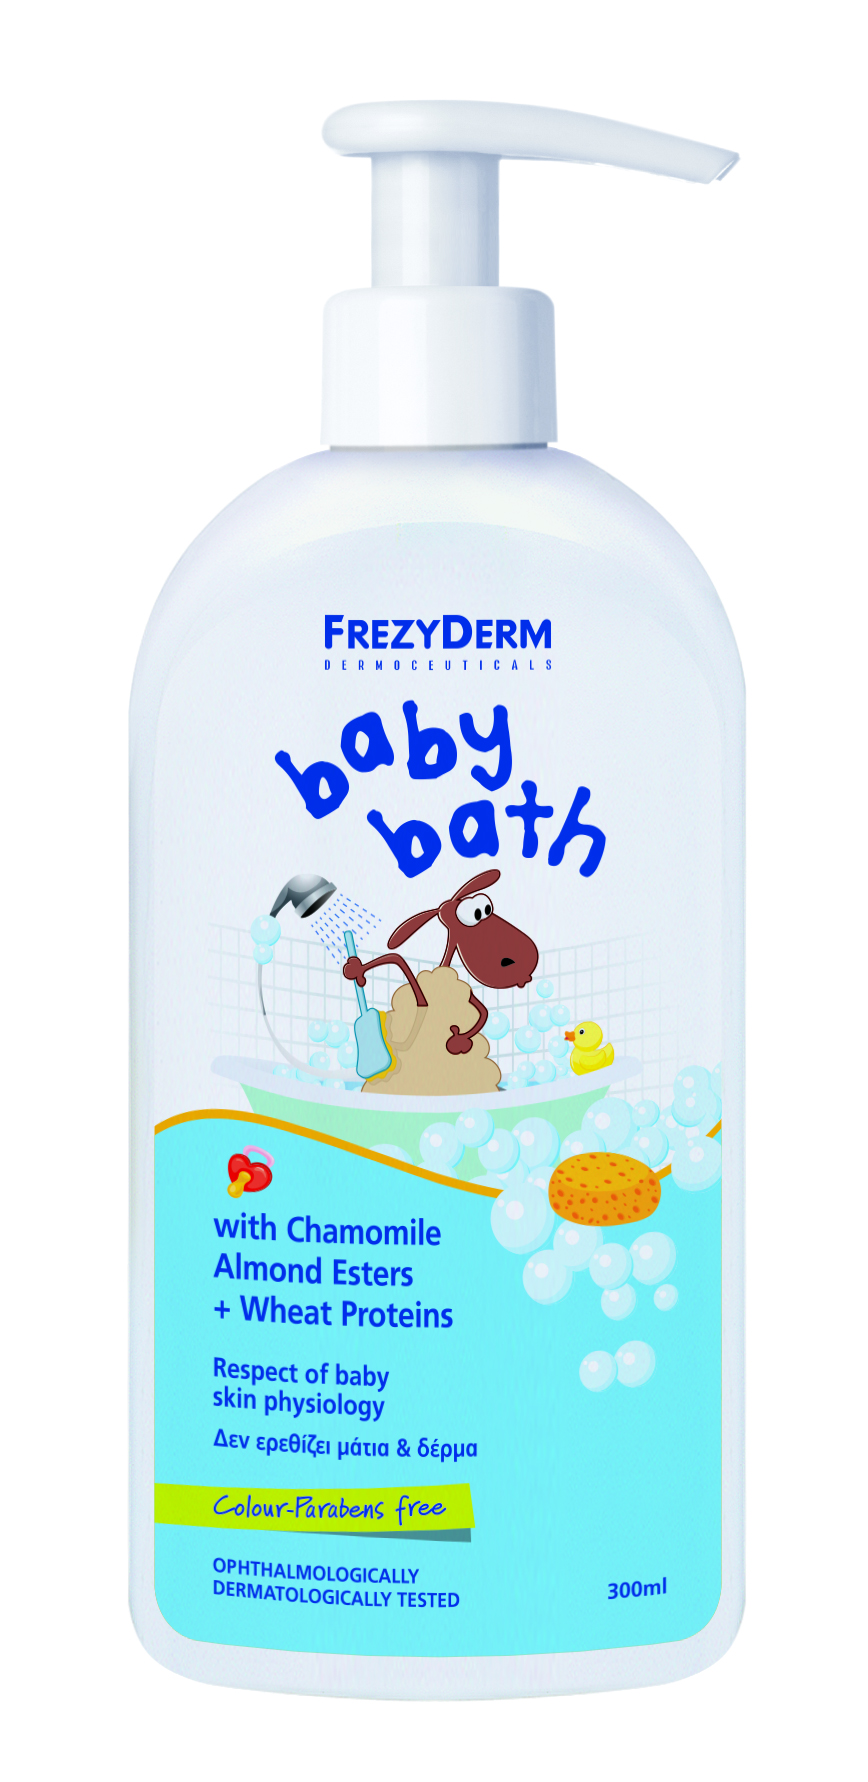 baby bath 300ml merged 2